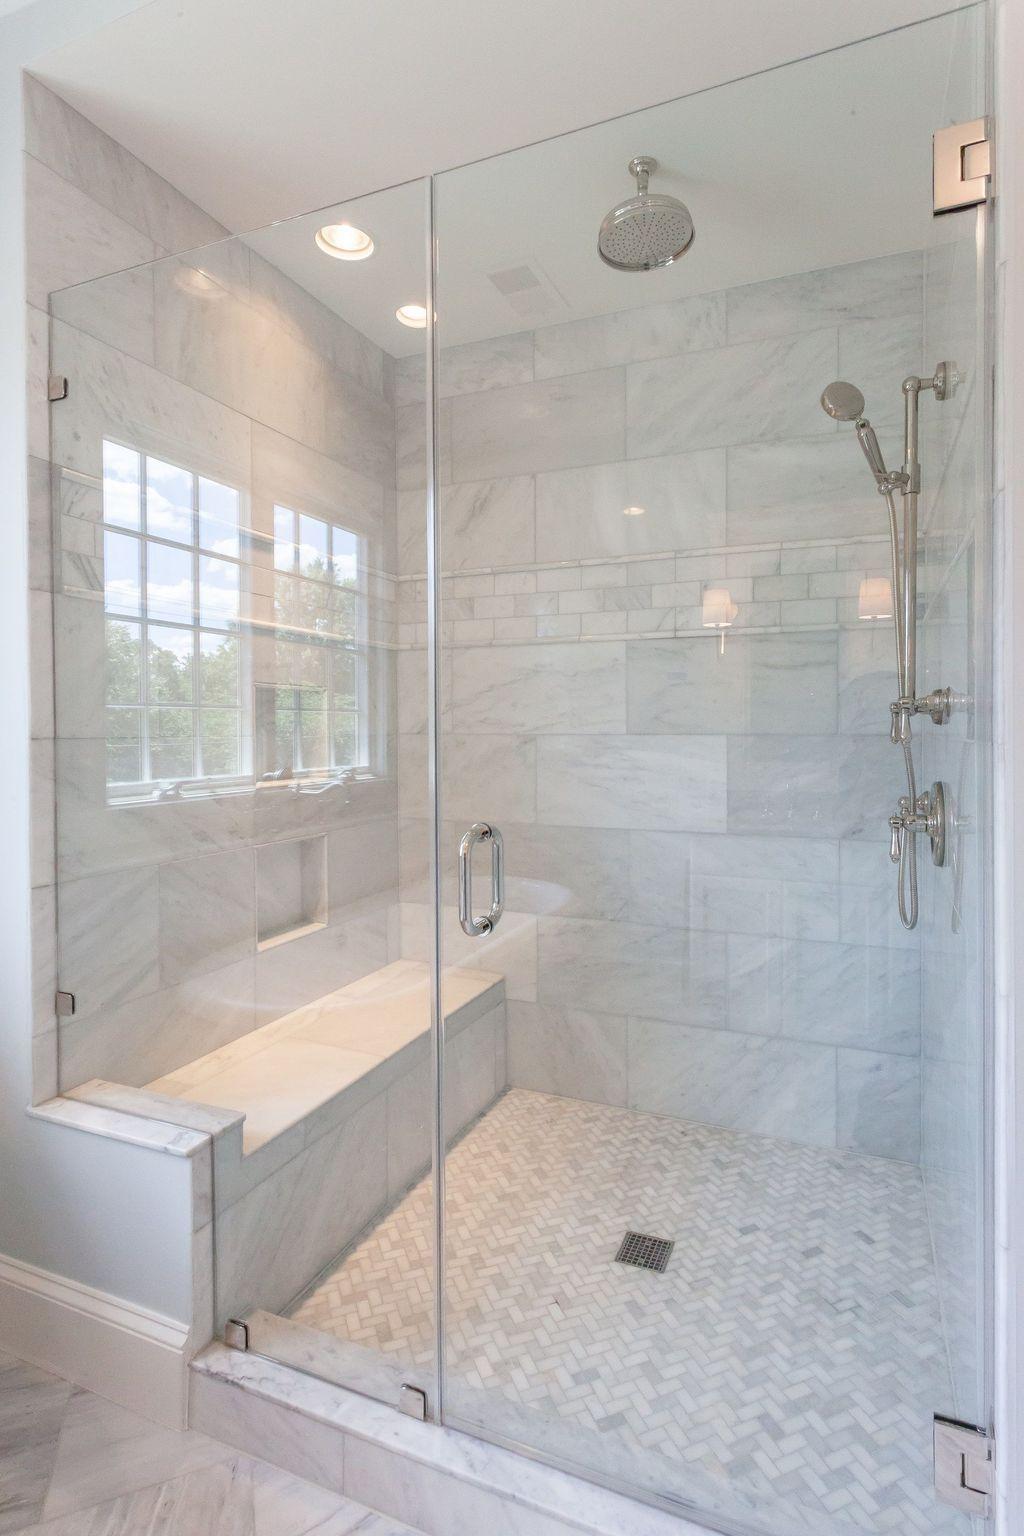 20 Unusual Master Bathroom Remodel Ideas In 2020 Bathroom